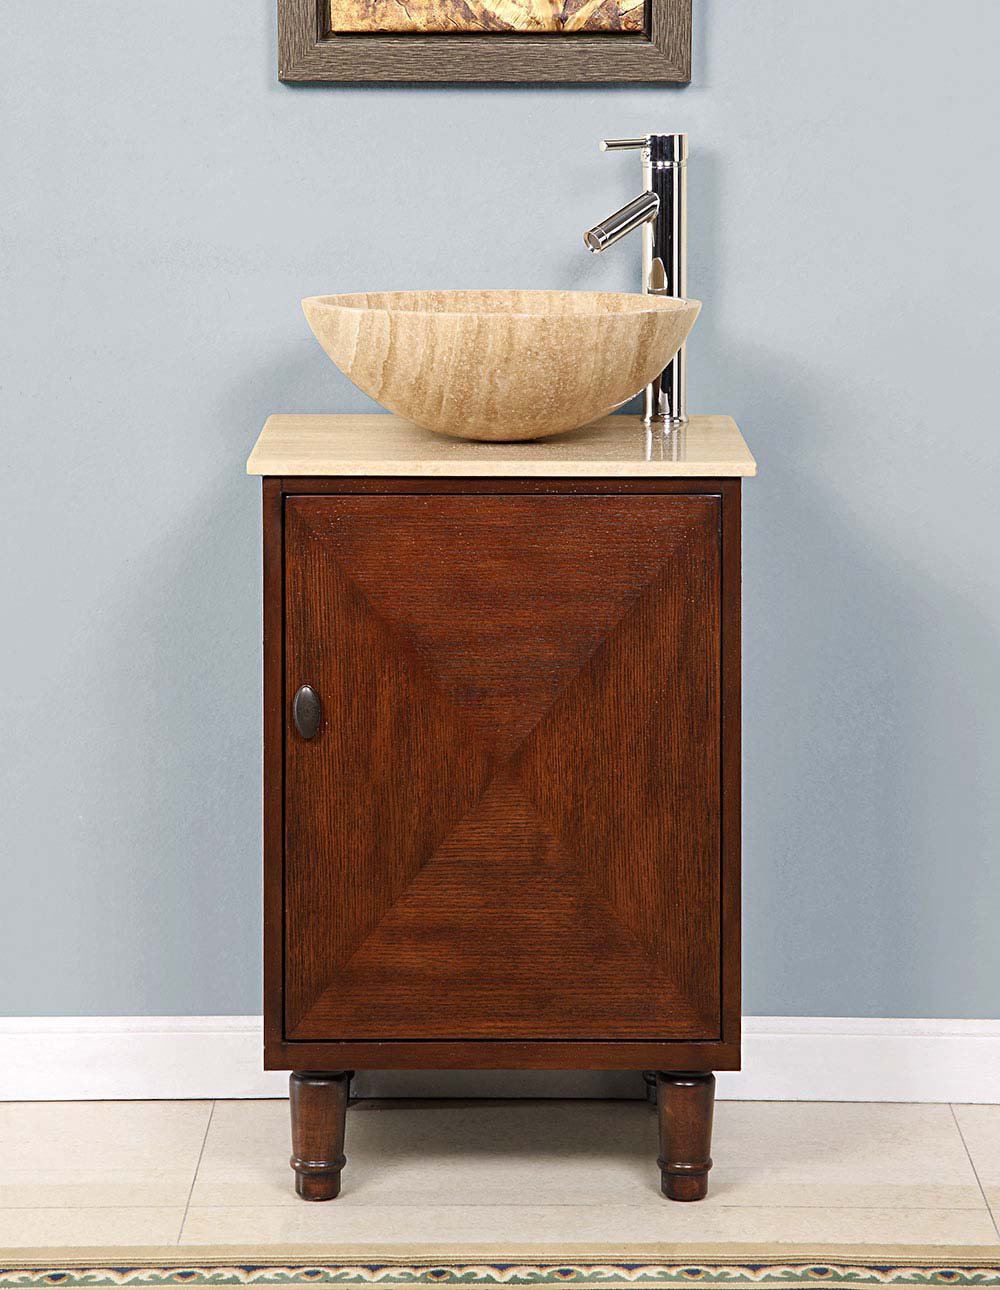 Accord Contemporary 20 inch Travertine Vessel Sink Vanity